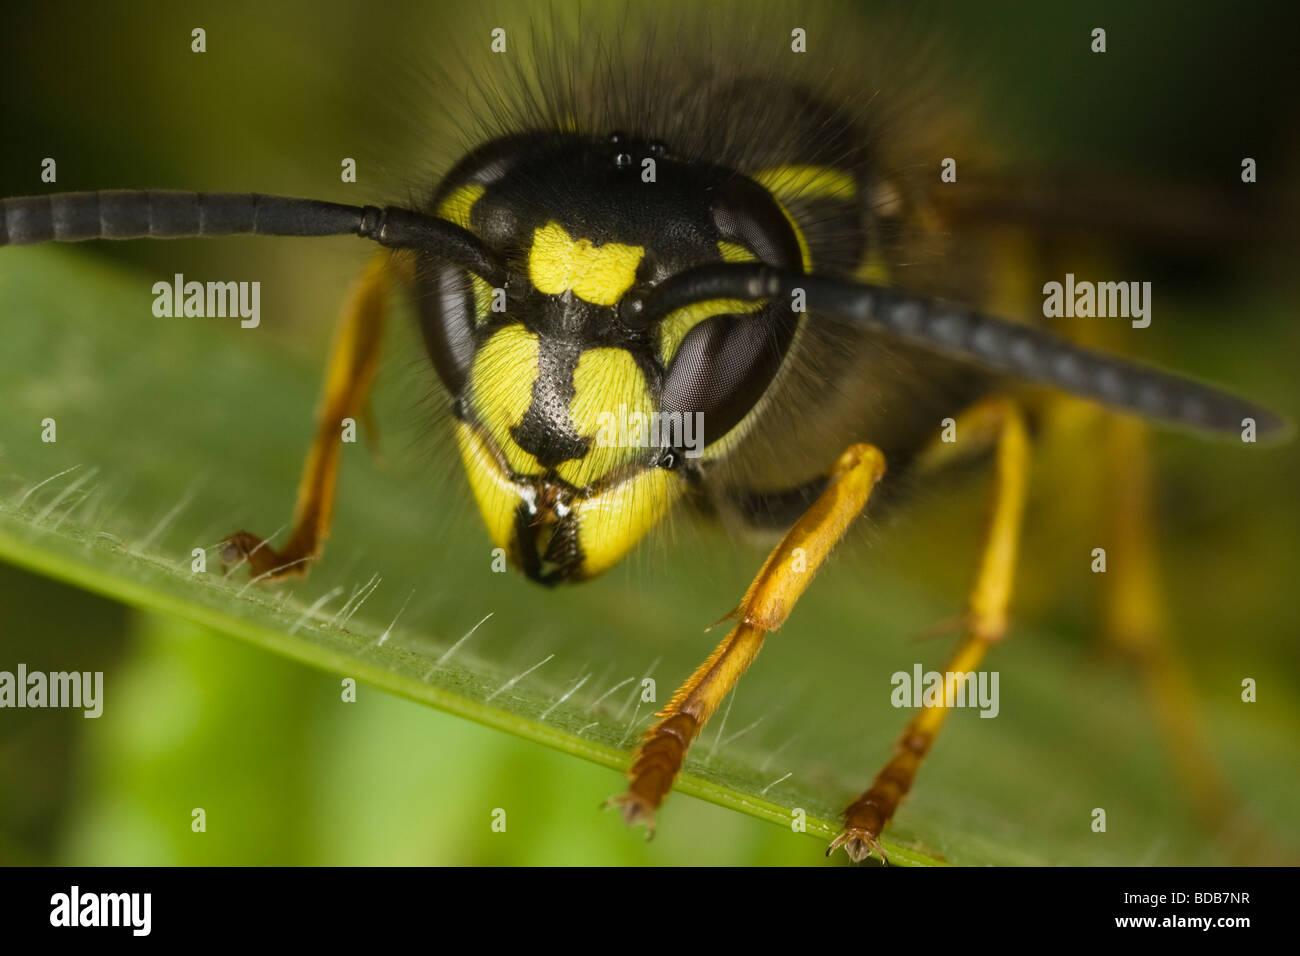 macro close-up of a Common Wasp (Vespula vulgaris) head - Stock Image